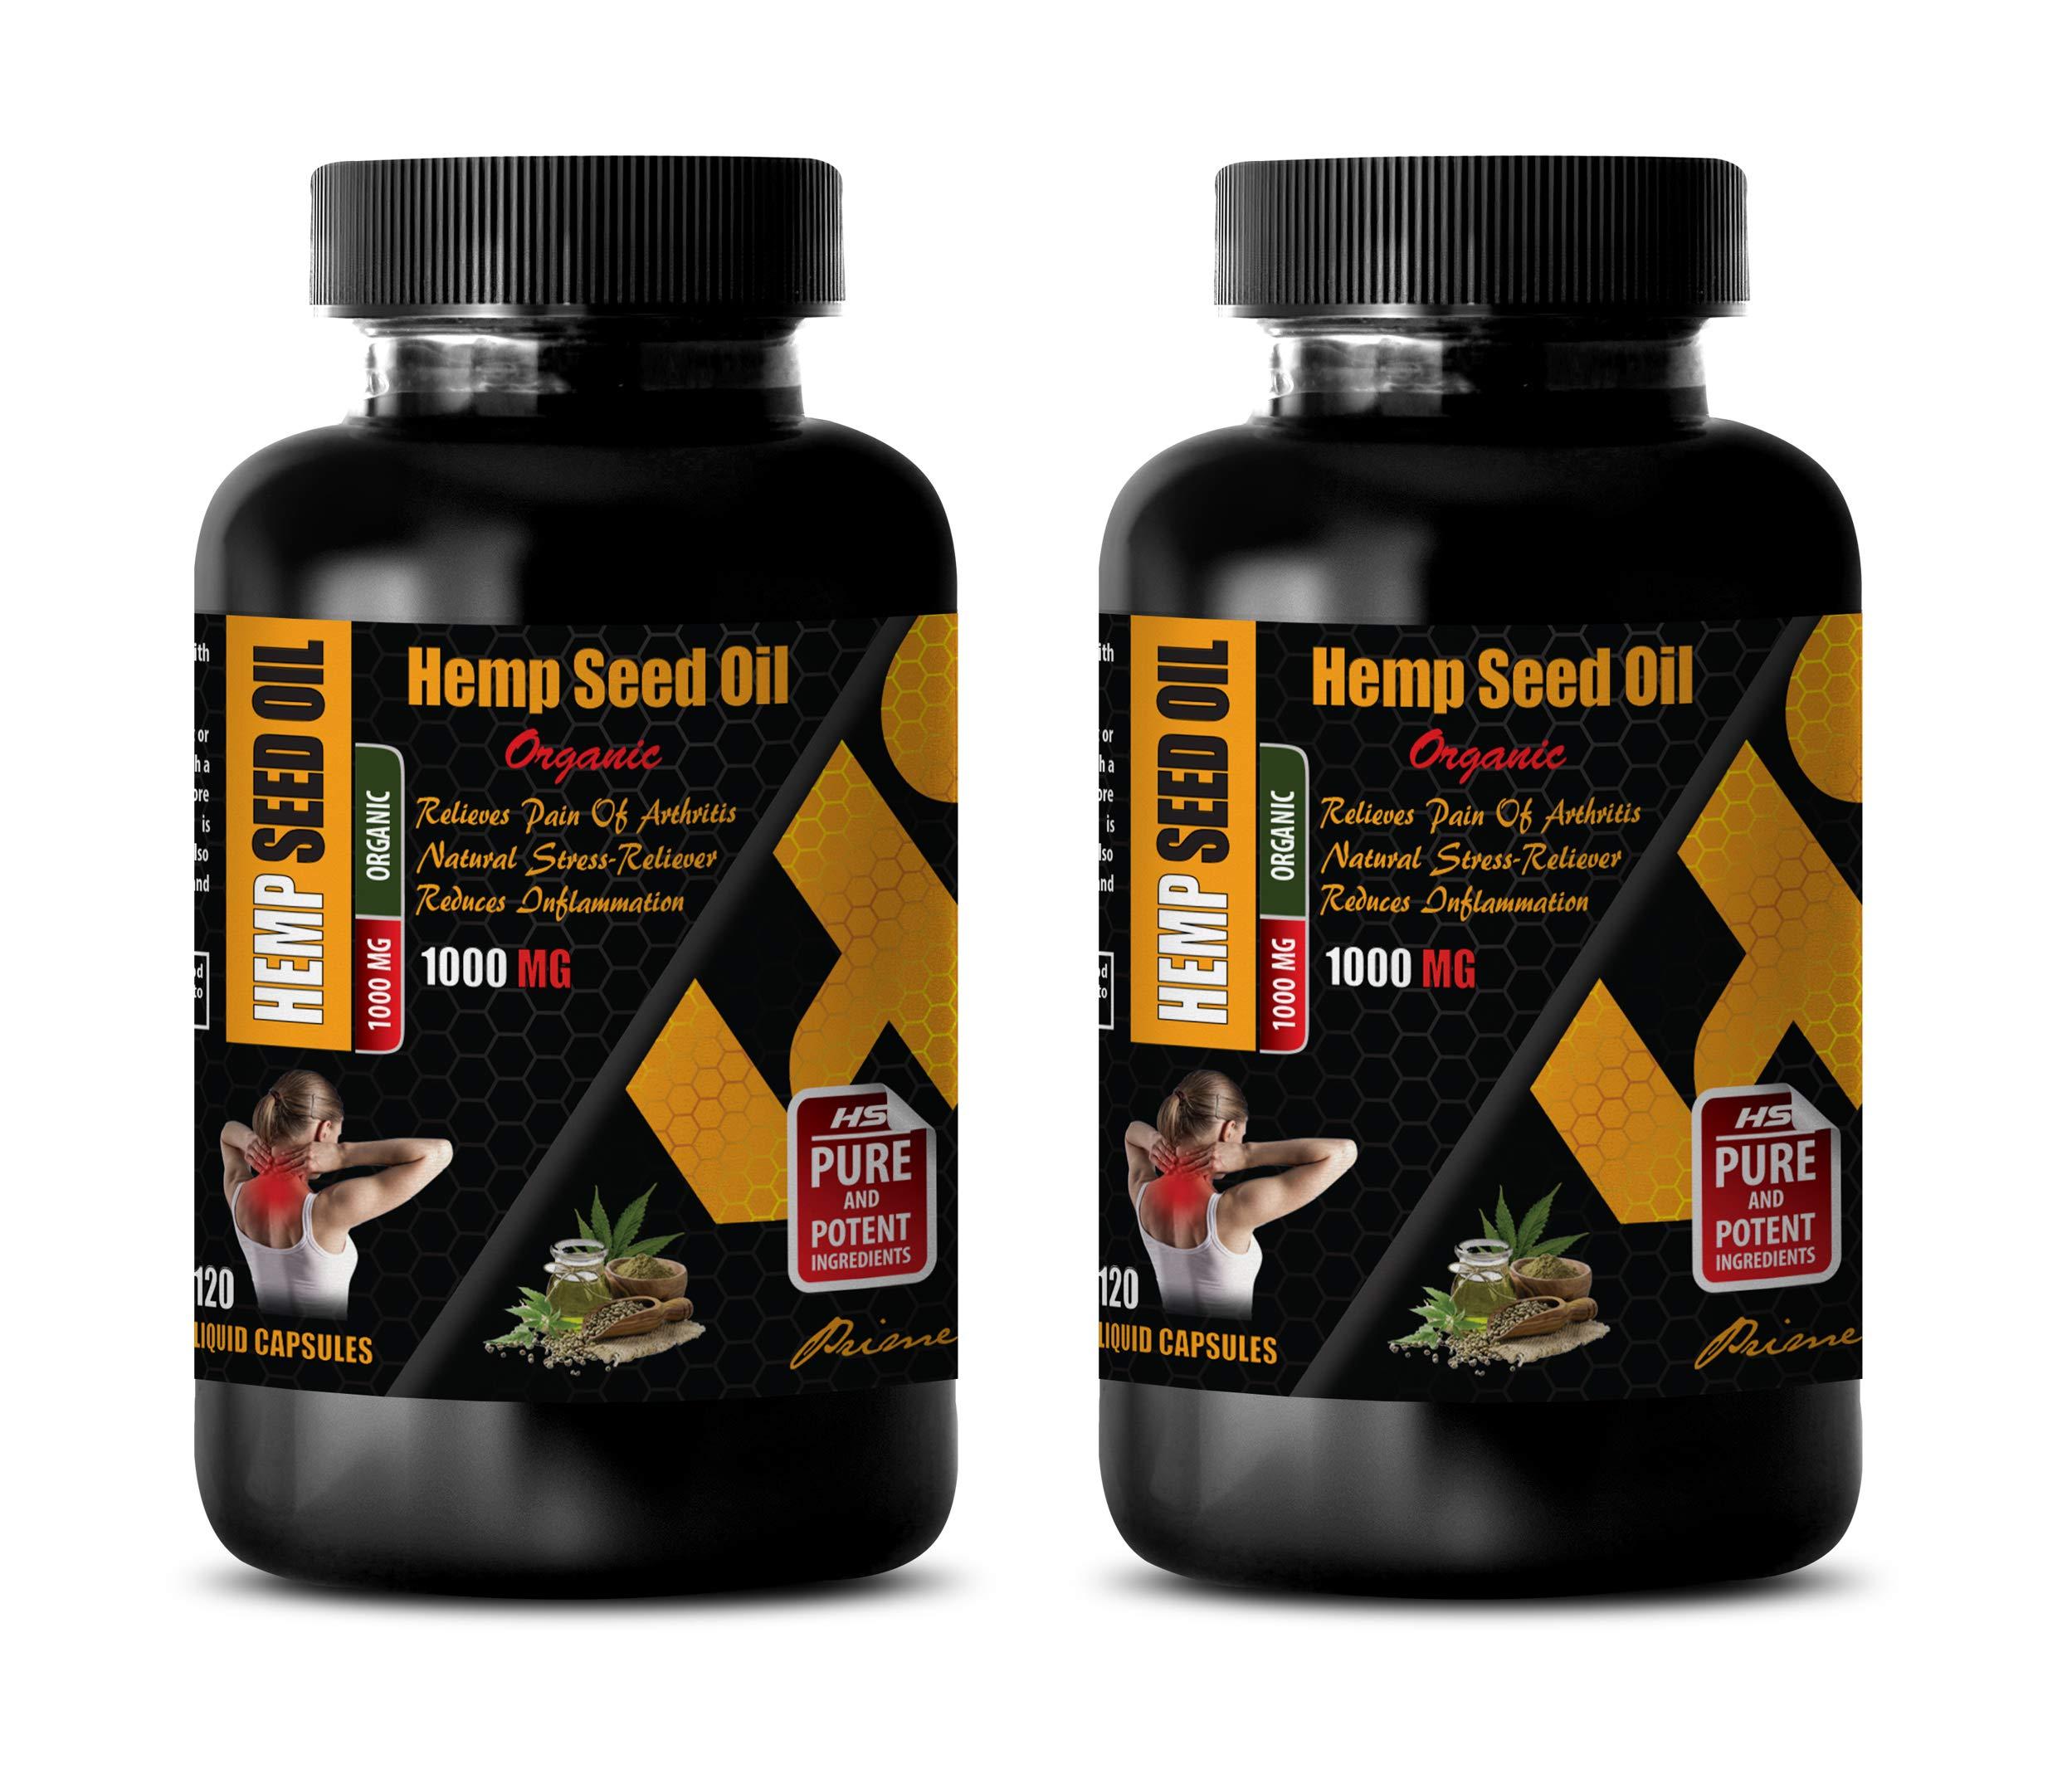 Pain Relief Supplement Natural - Hemp Seed Oil 1000 MG Organic - Dietary Supplement - Hemp Oil Vitamins - 2 Bottles (240 Liquid Capsules)